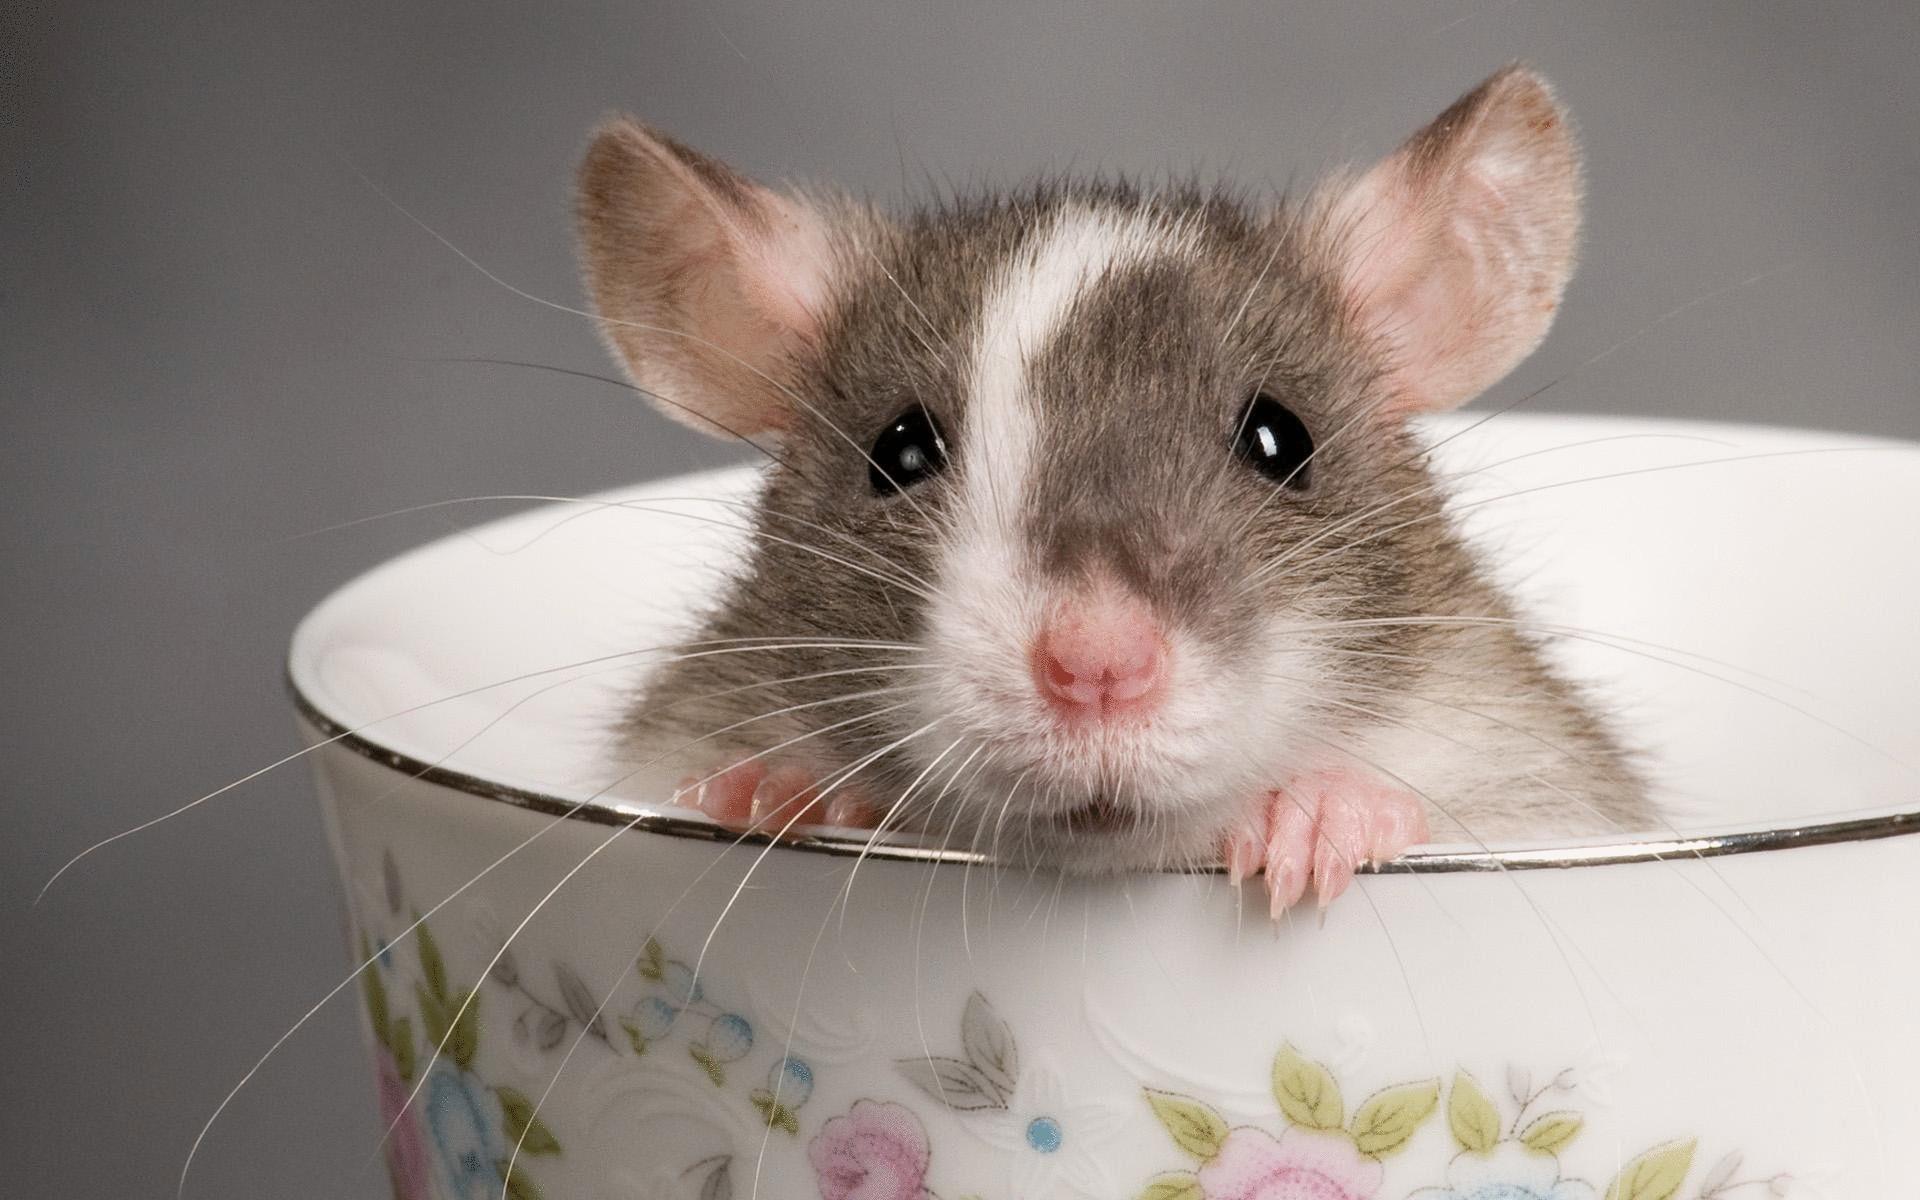 Мышка красивые картинки, спасибо